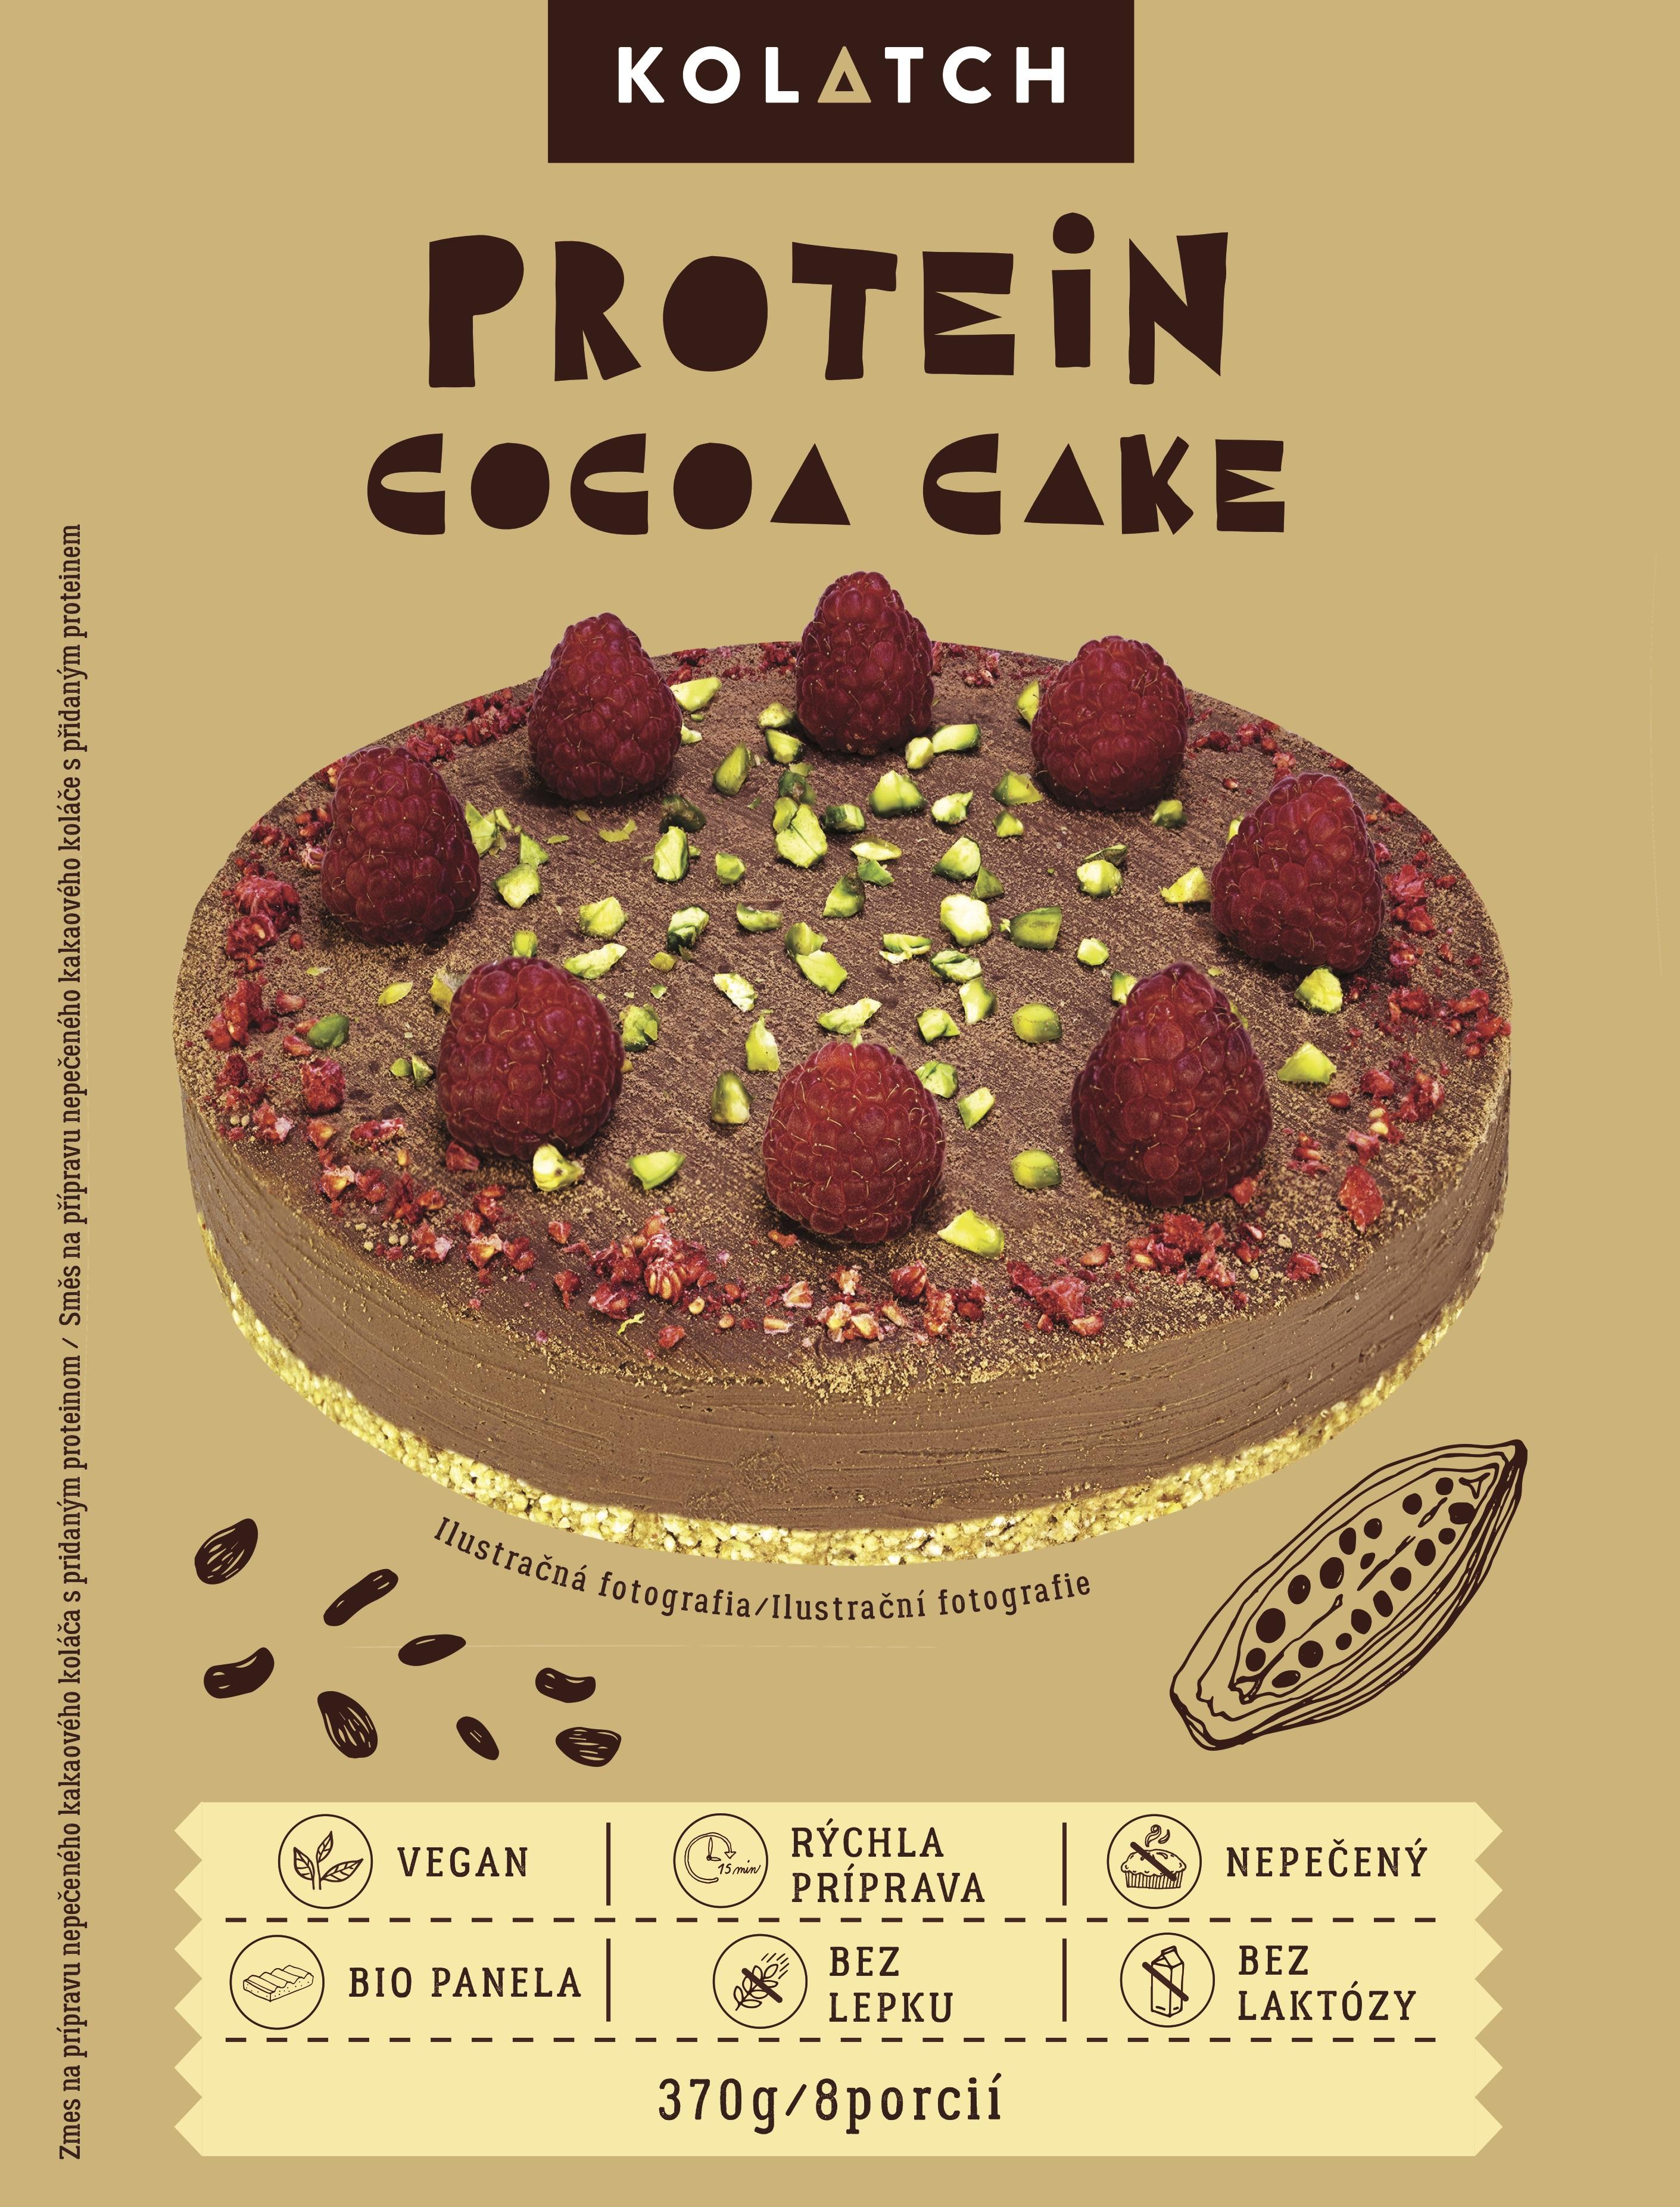 Proteínový kakaový koláč